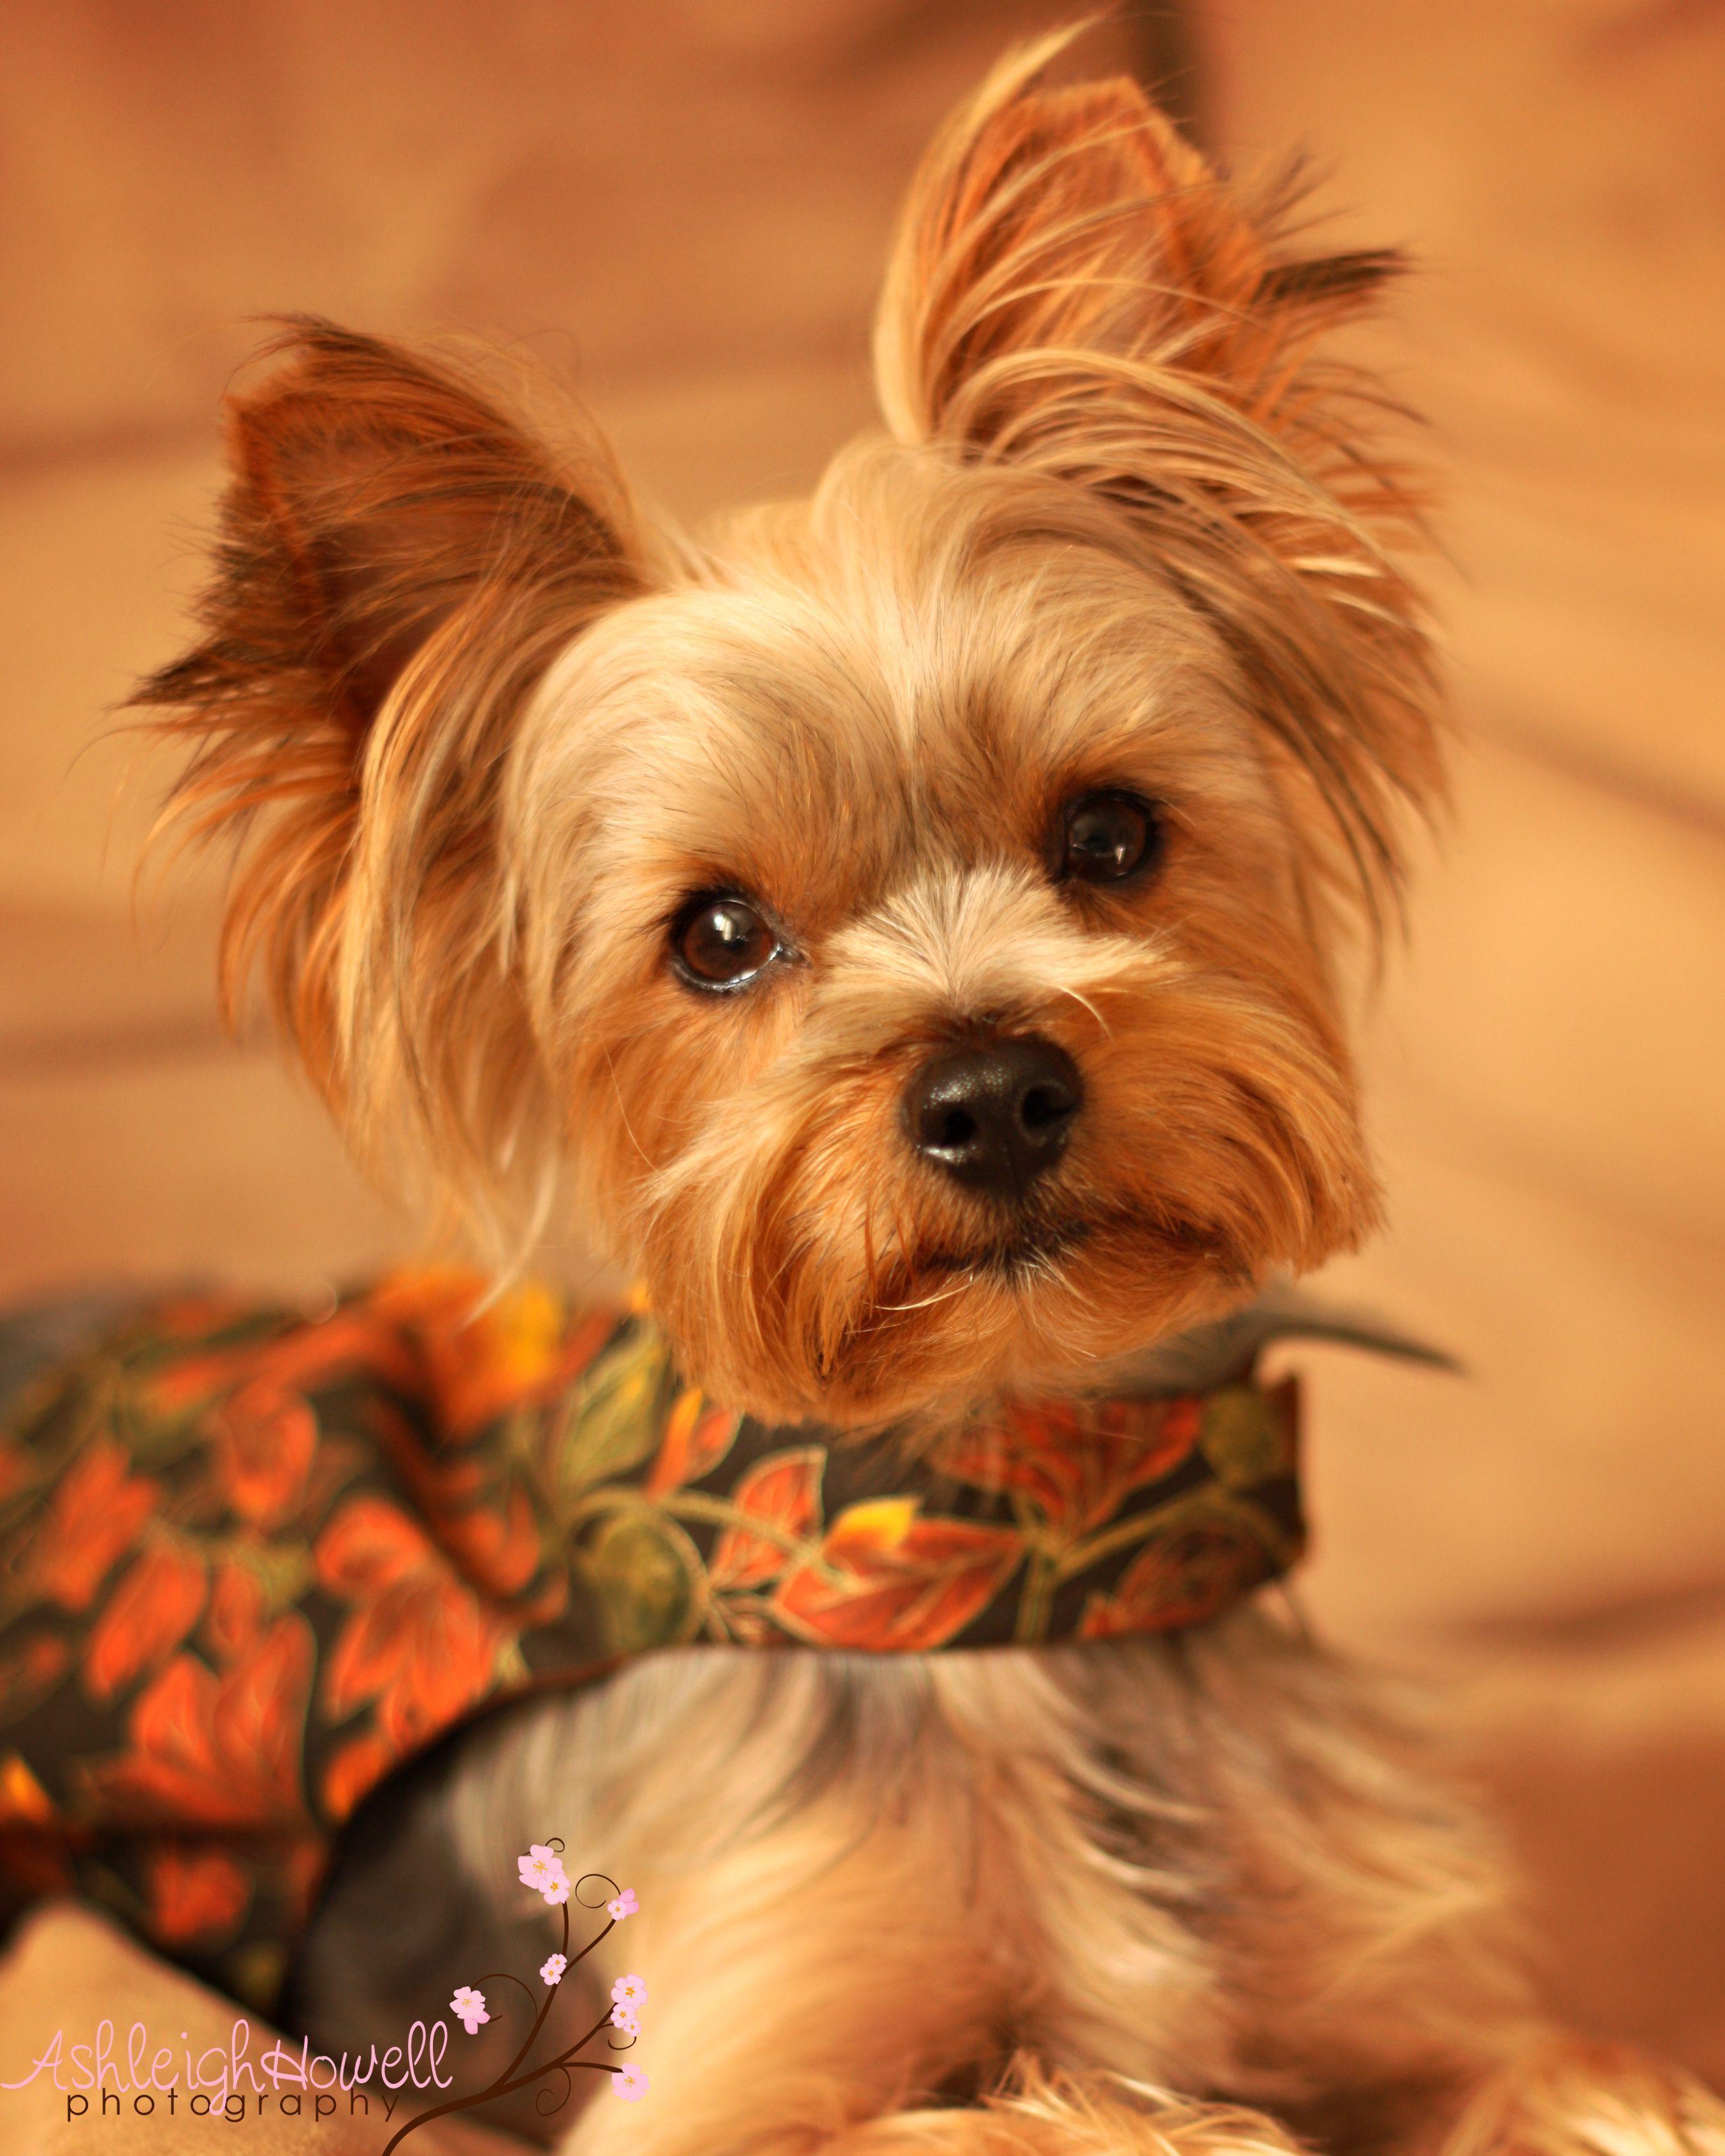 .yorkshire Terrier Dogs Puppy Hound Pups Dog Puppies ...